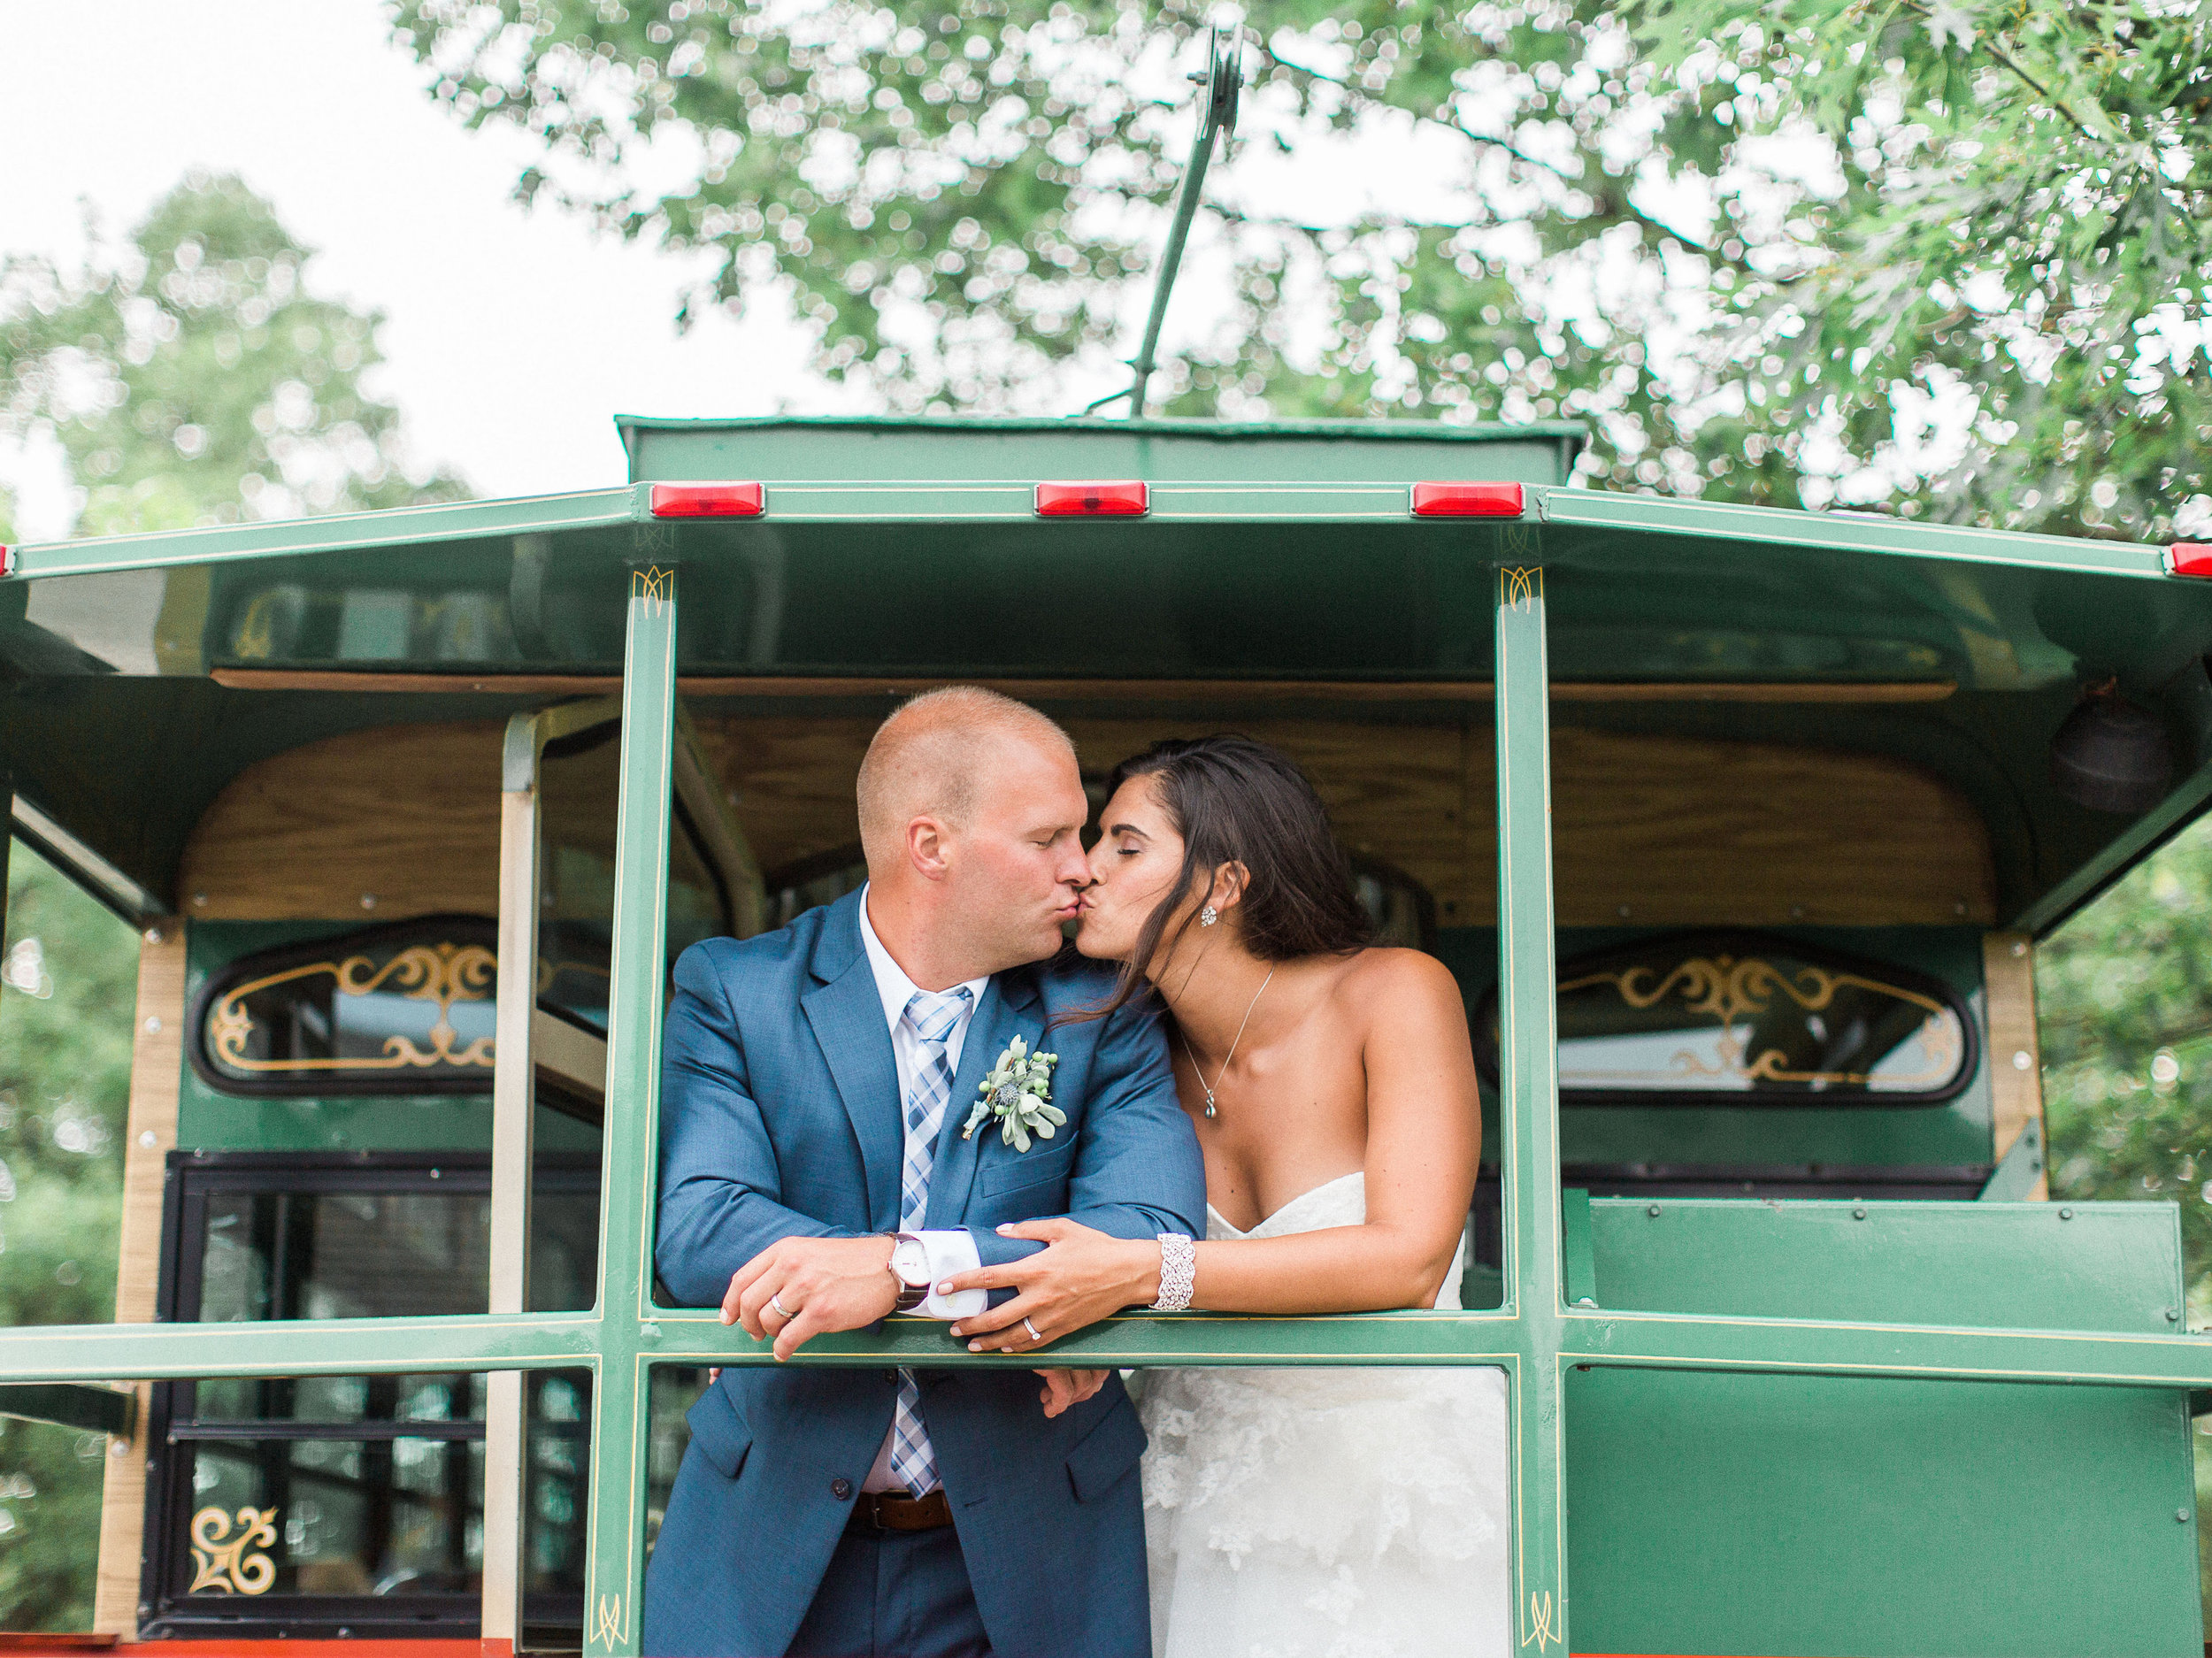 ERIC AND HALLIE WEDDING-HI RESOLUTION FOR PRINTING-0747.jpg